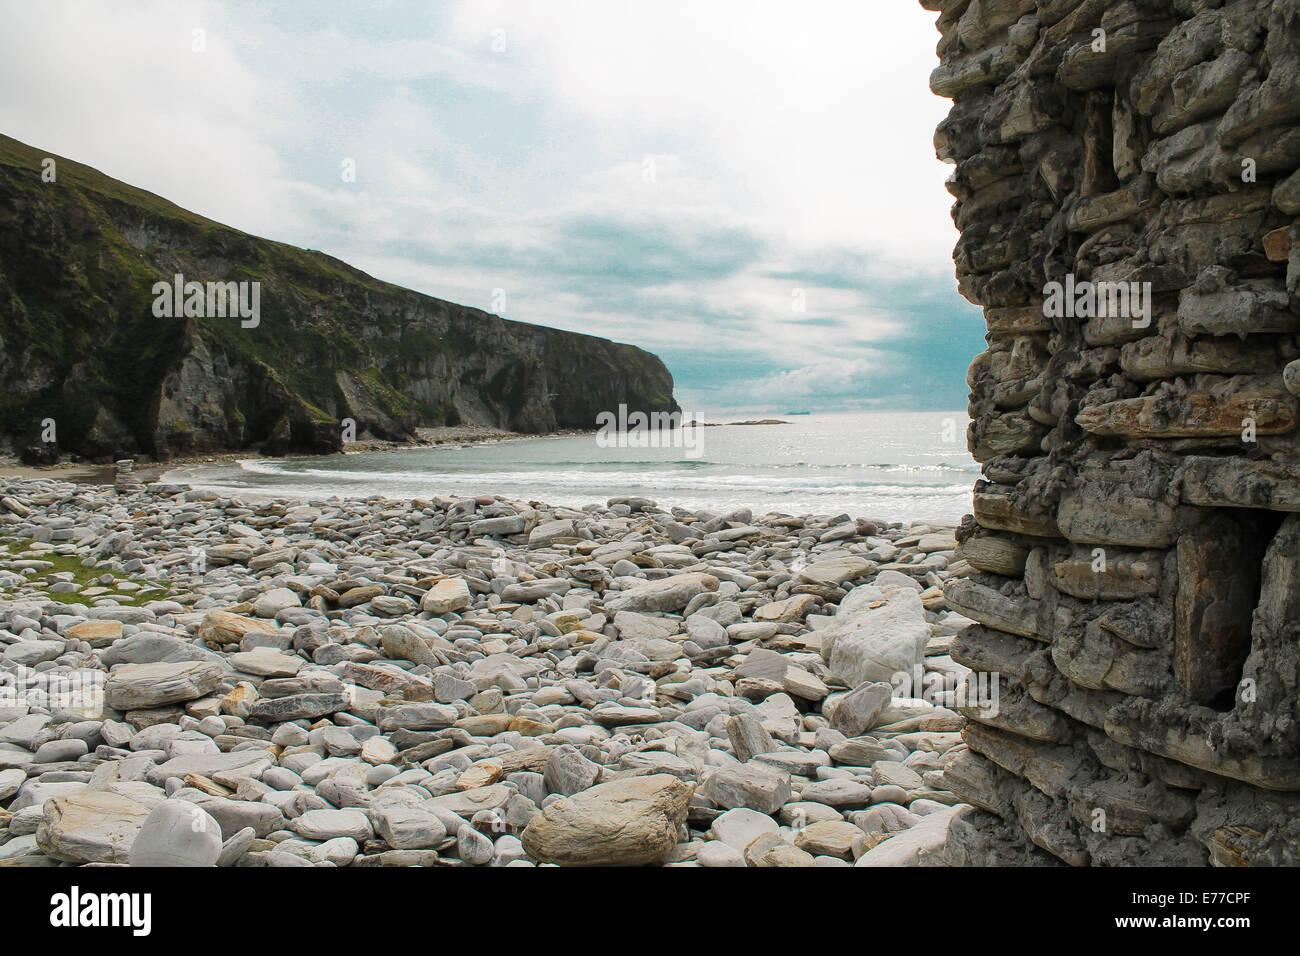 Small Castle Keel Beach, Achill Island, Ireland - Stock Image